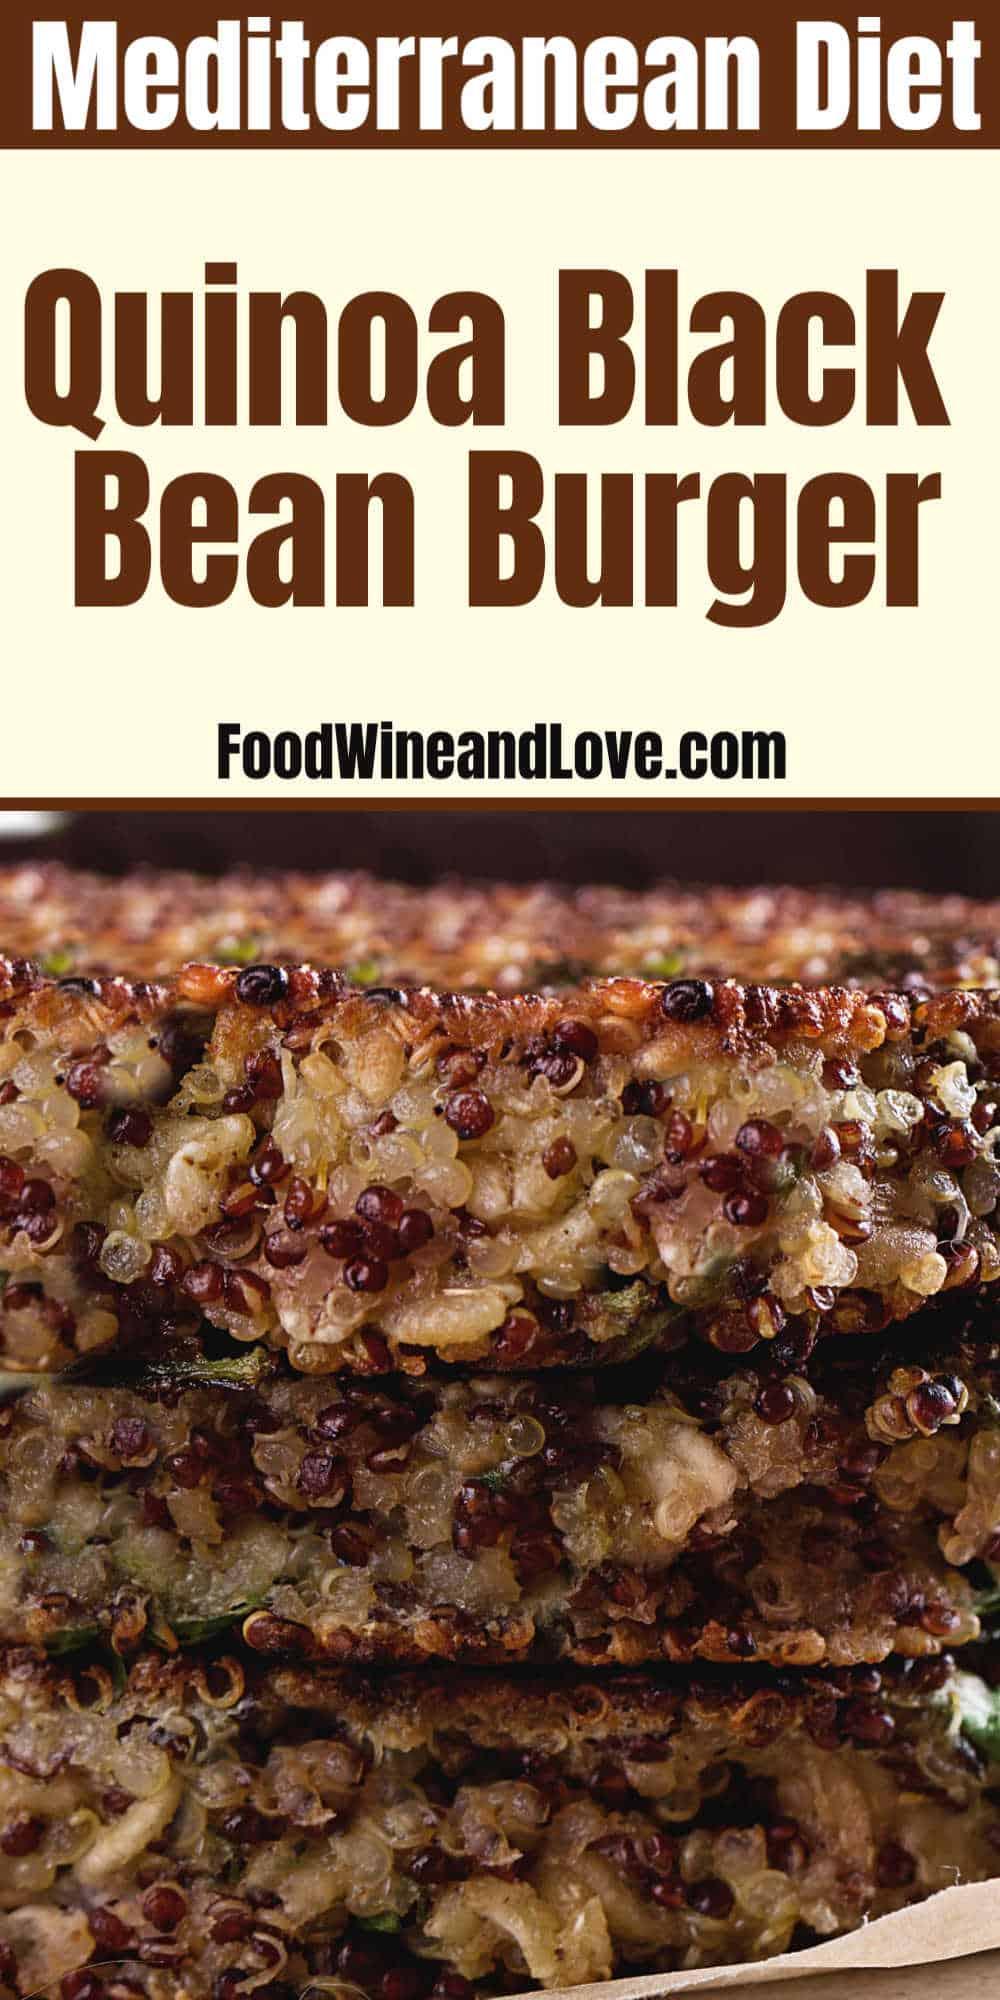 Quinoa Black Bean Burger